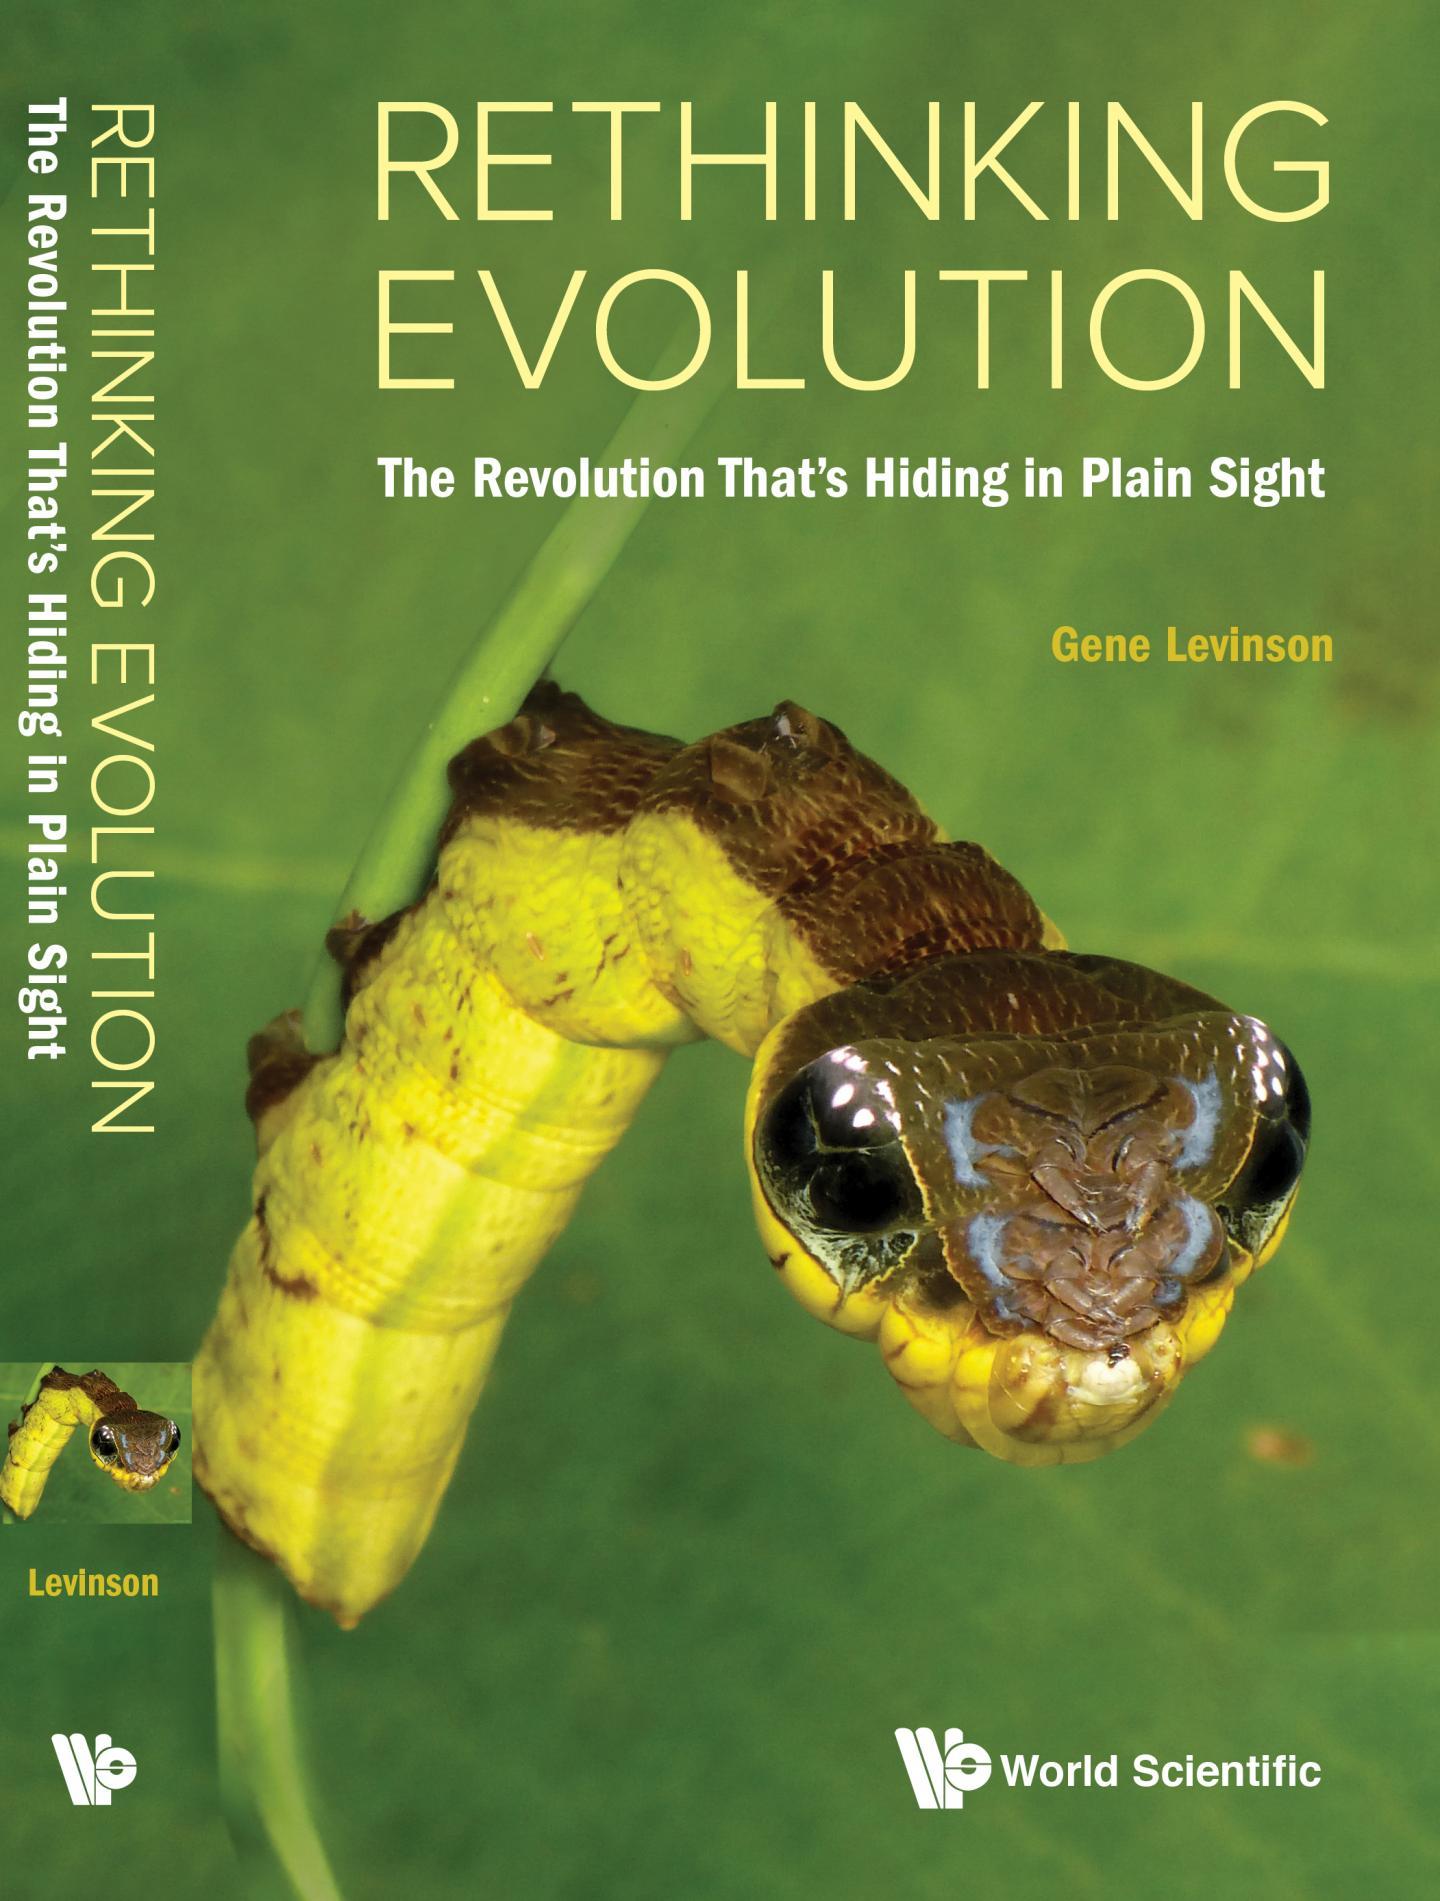 Rethinking Evolution: the Revolution That's Hiding in Plain Sight